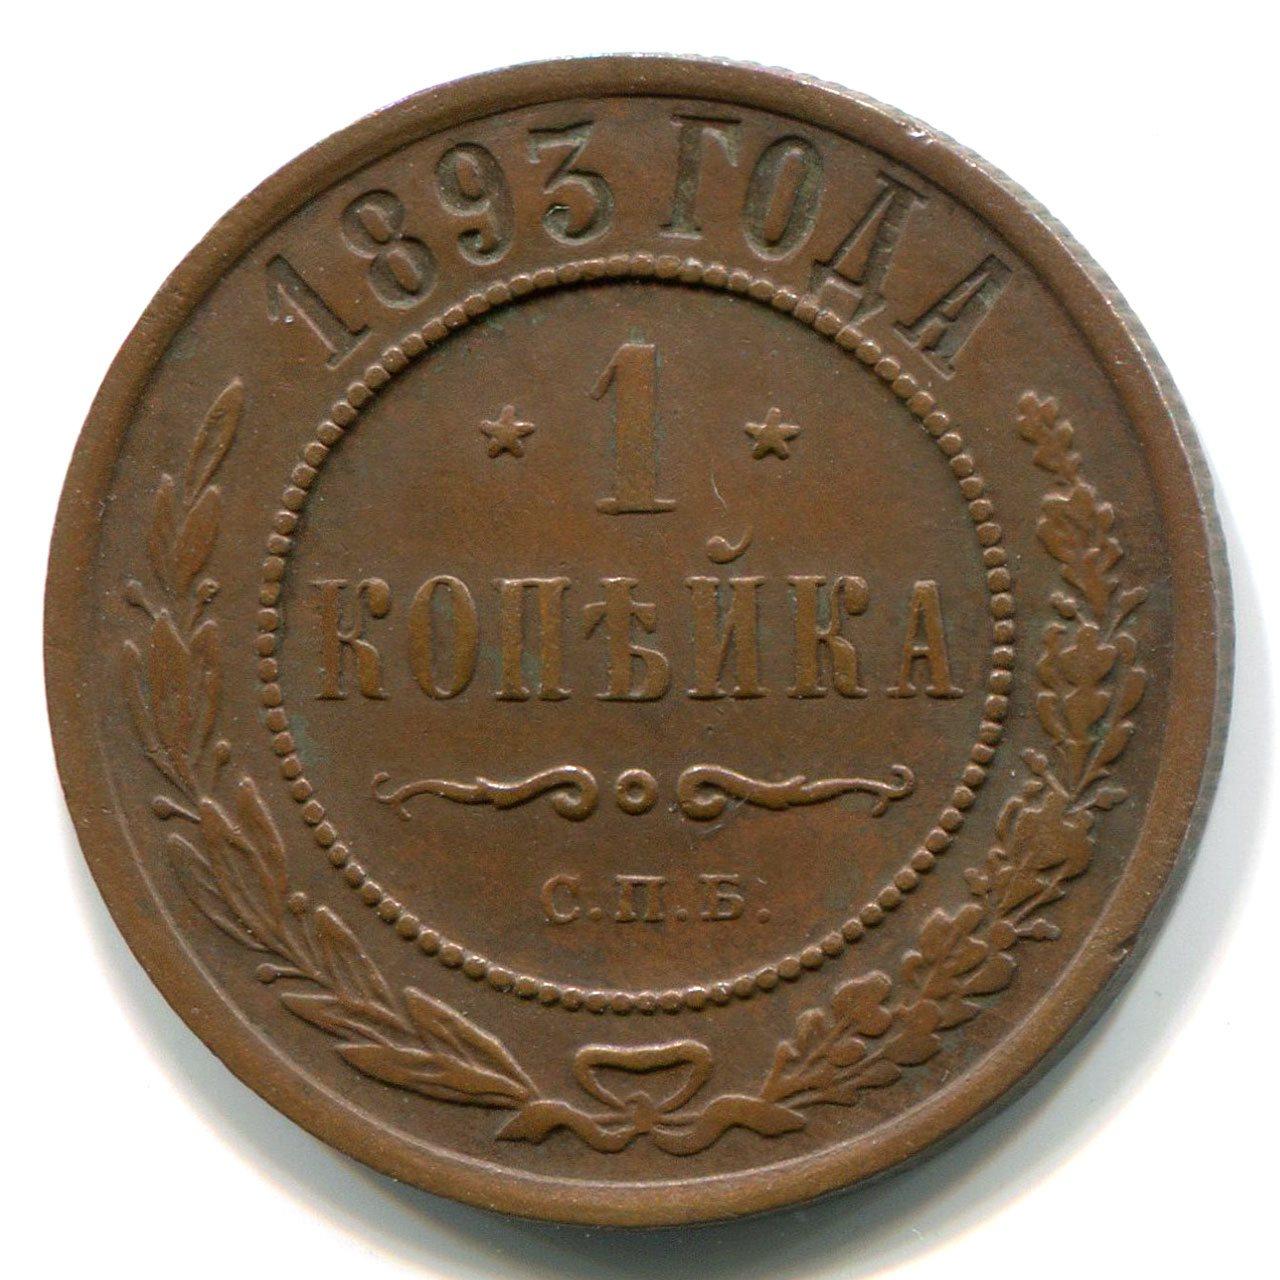 1 копейка 1893 года цена номер лота аукциона